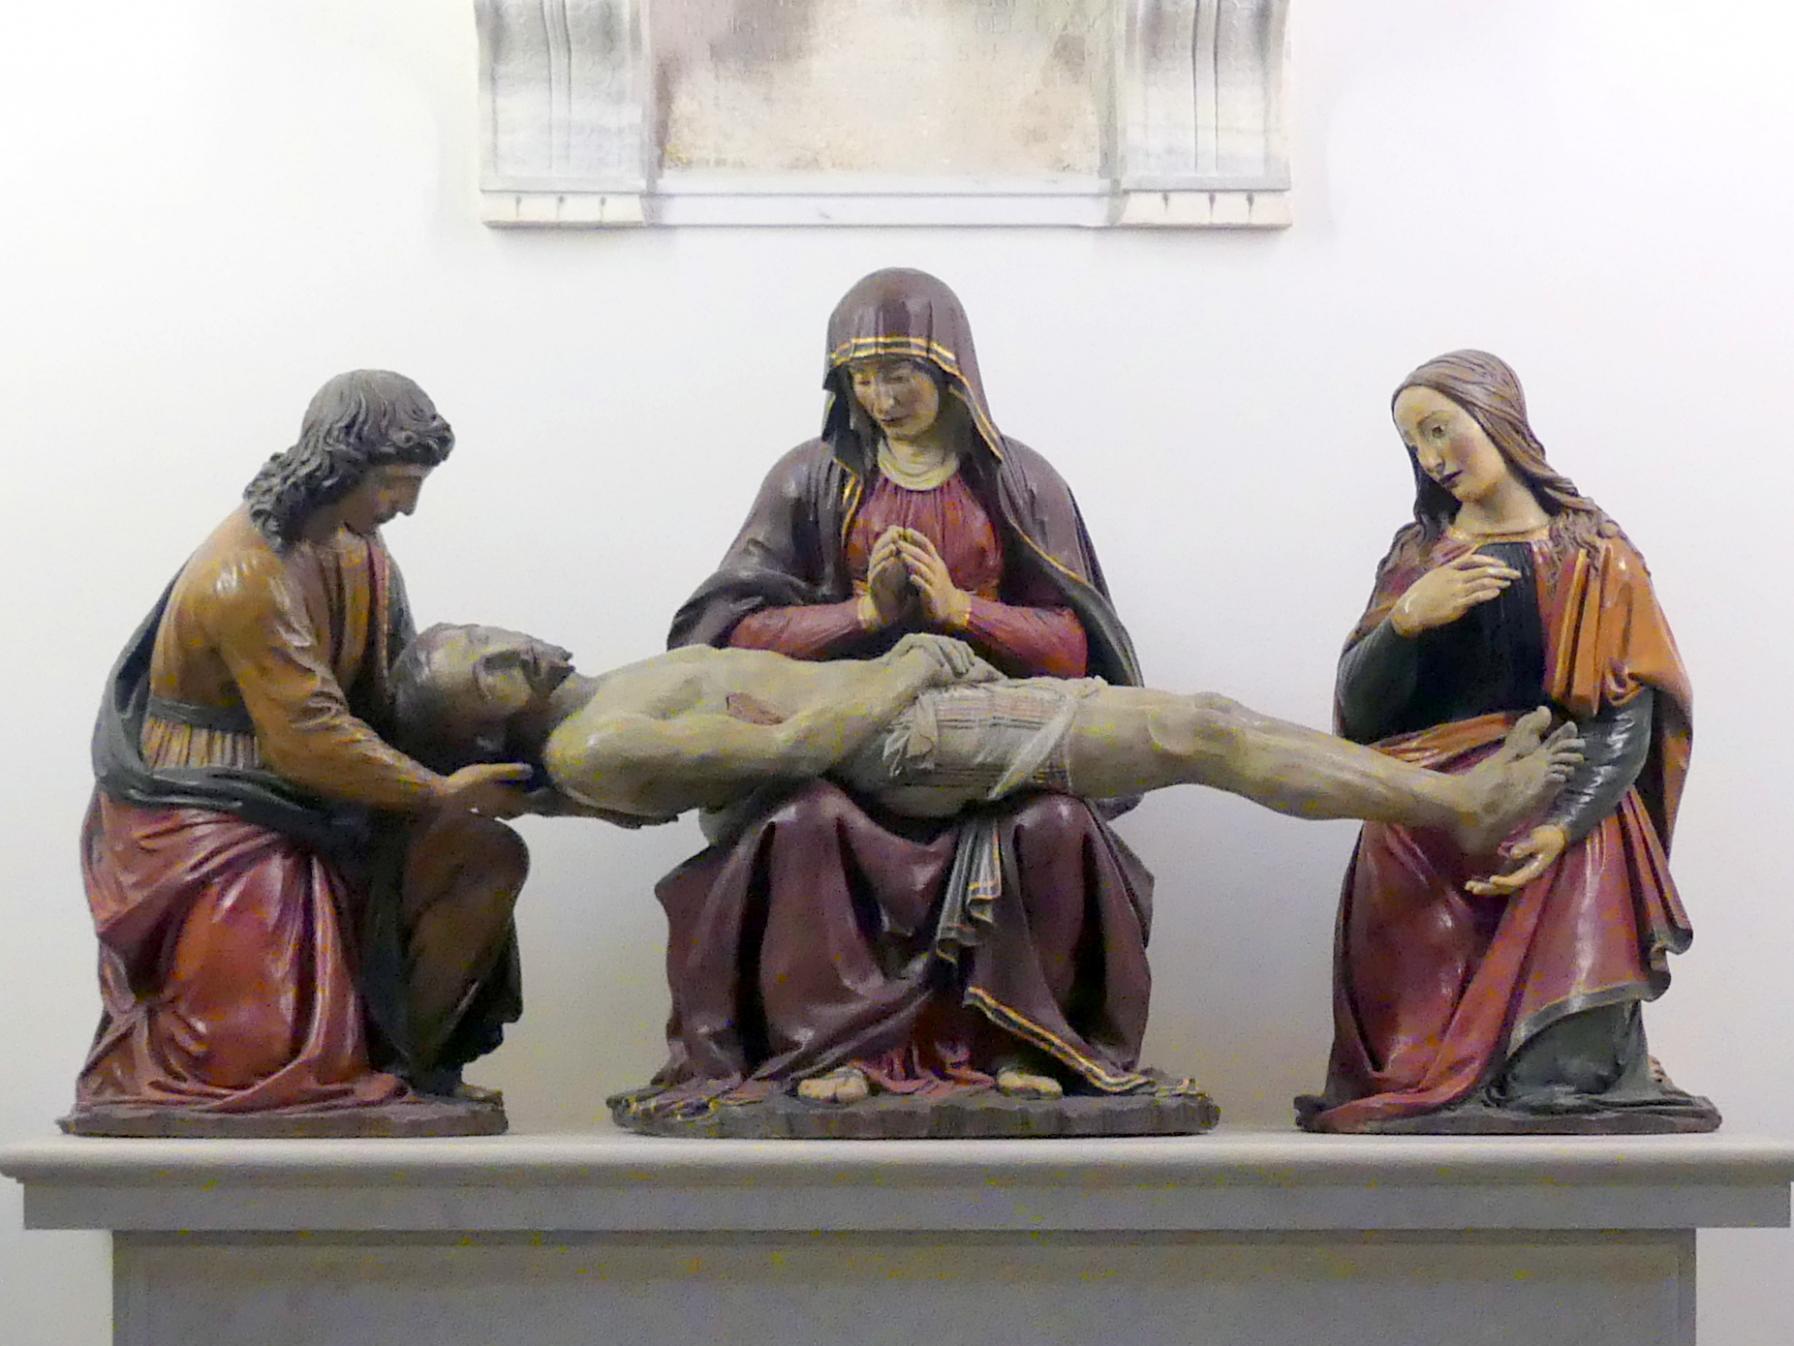 Leonardo del Tasso: Beweinung Christi, Ende 15. Jhd.